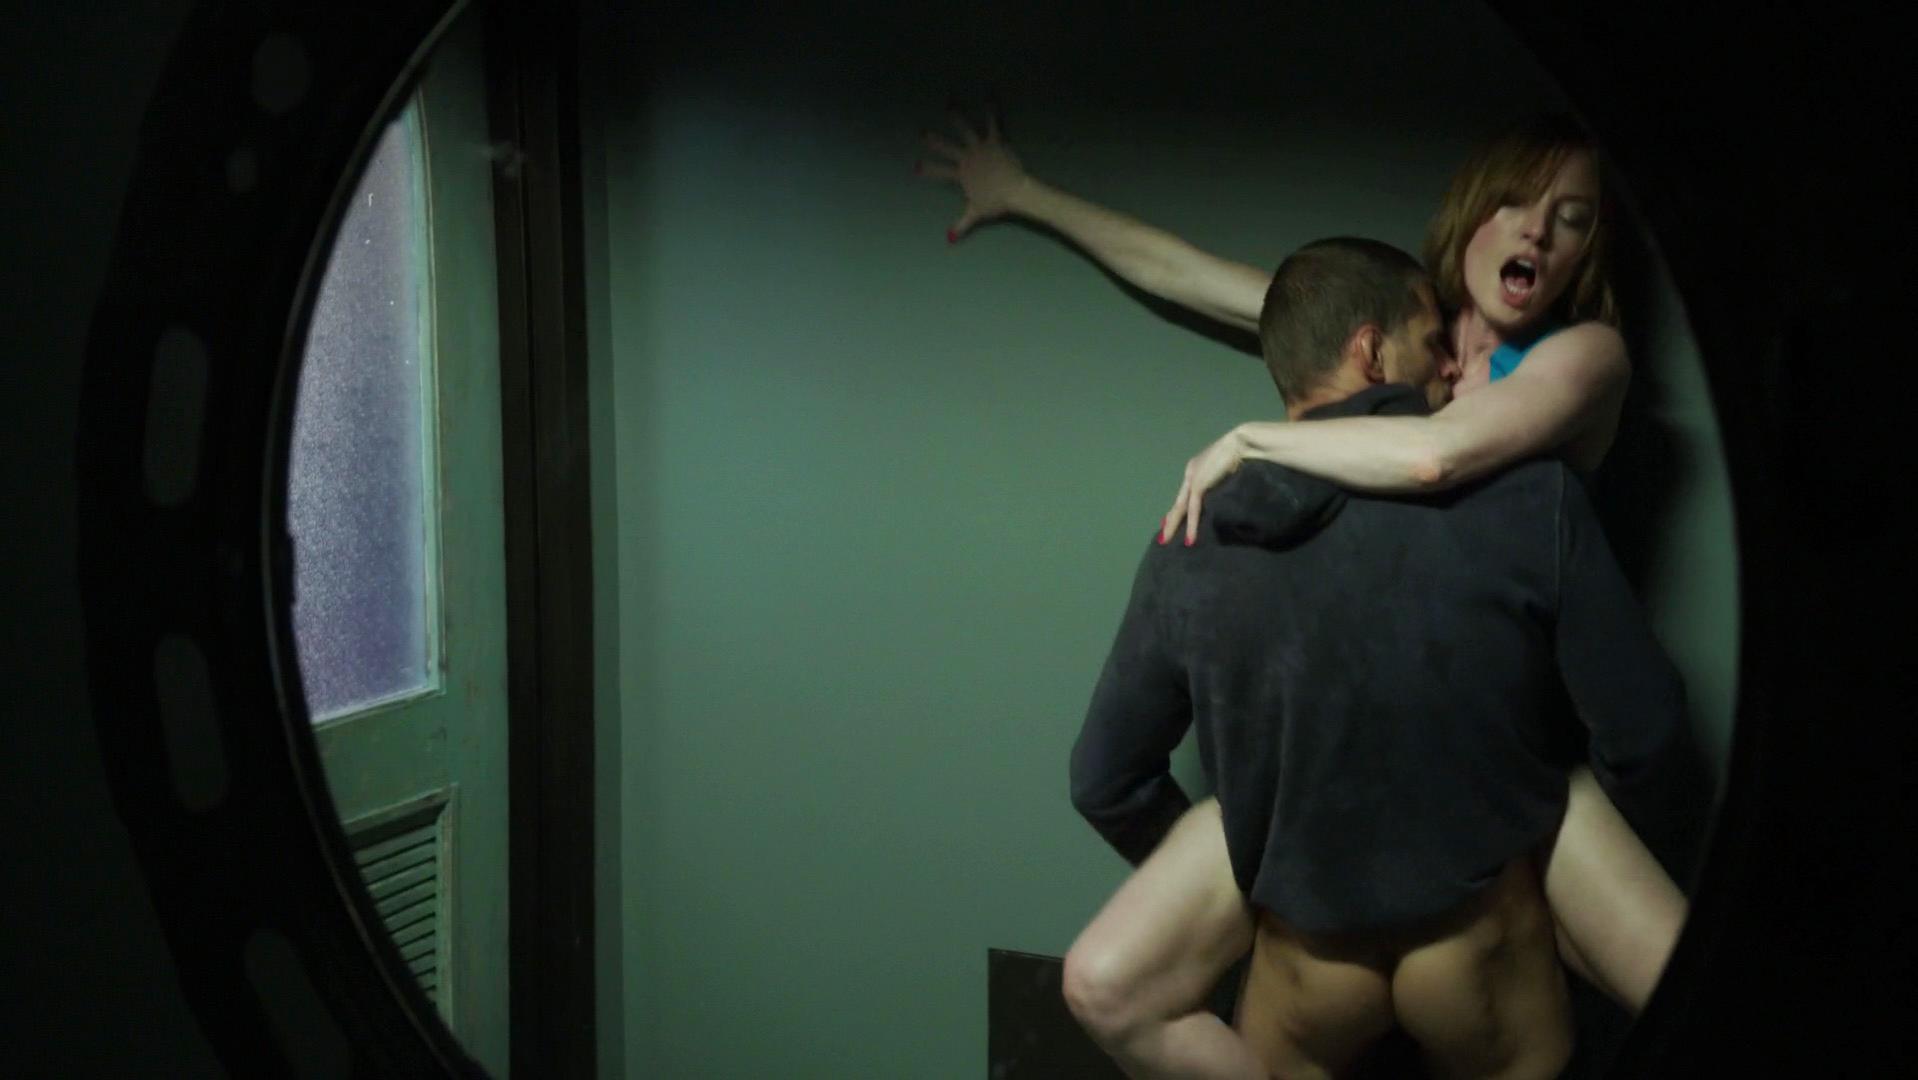 Abigail Wake nude, Alicia Witt nude - Kingdom s01e02-04 (2014)